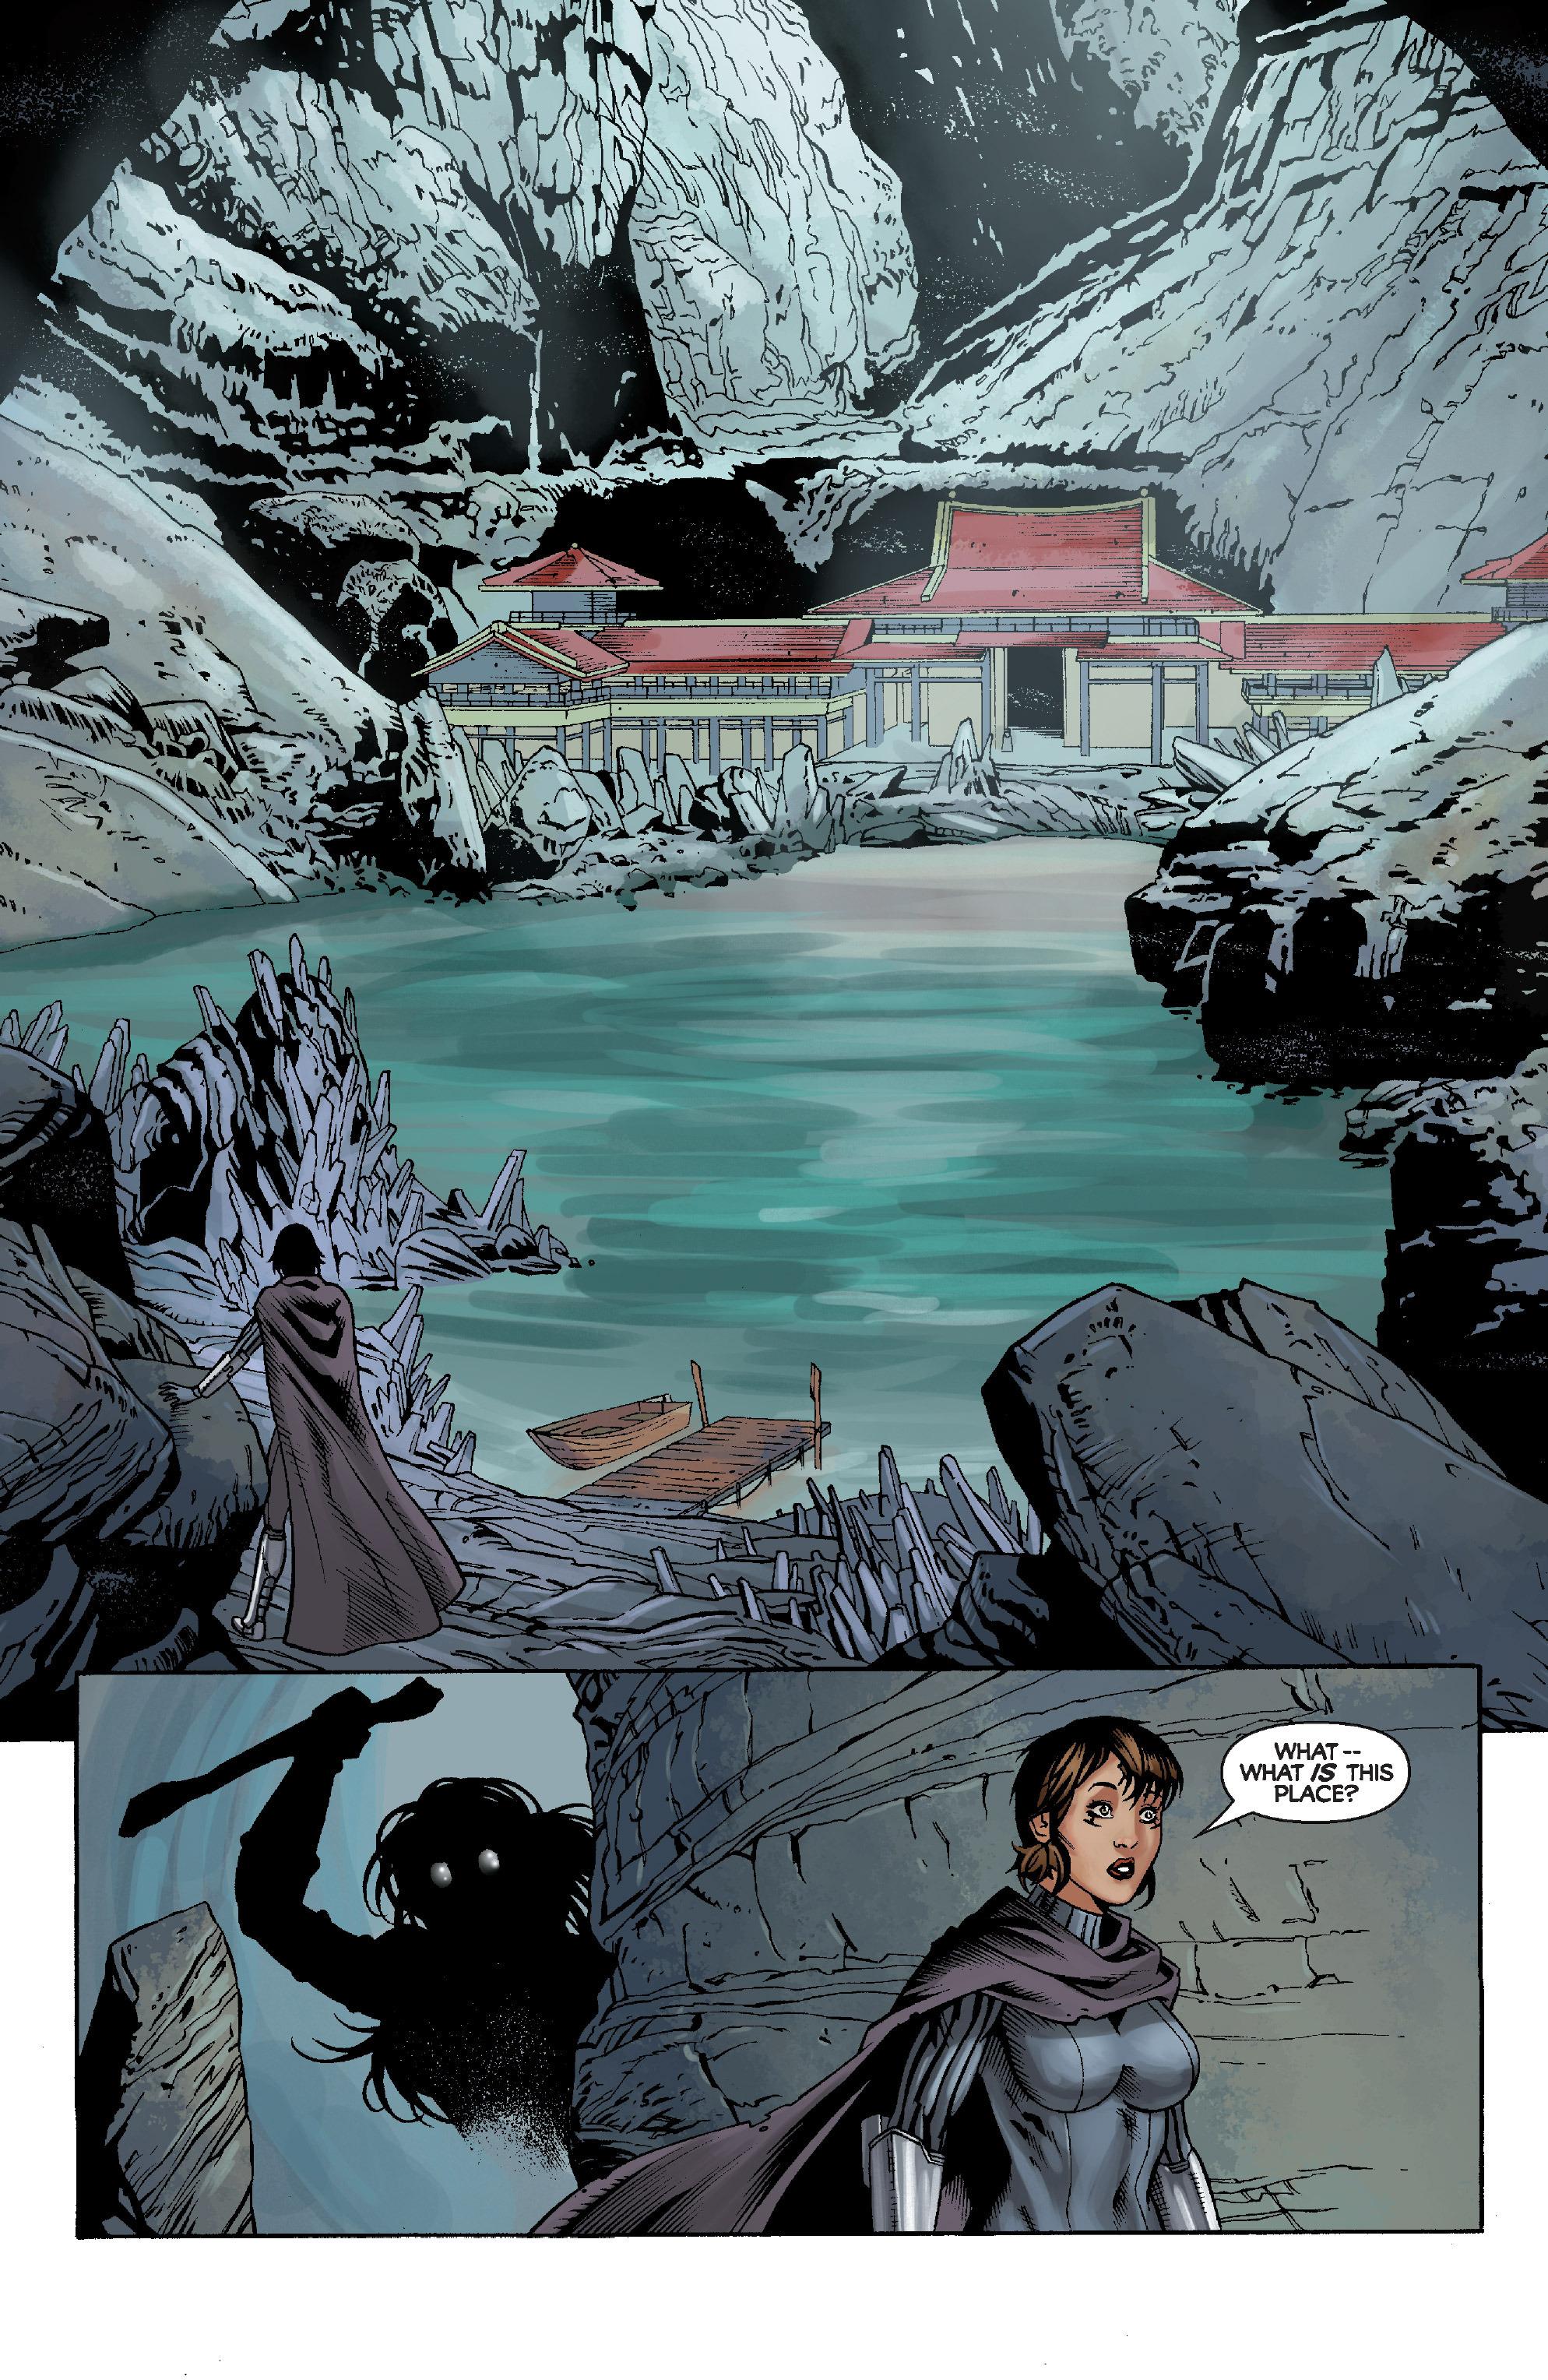 Read online Star Wars: Knight Errant - Escape comic -  Issue #2 - 12